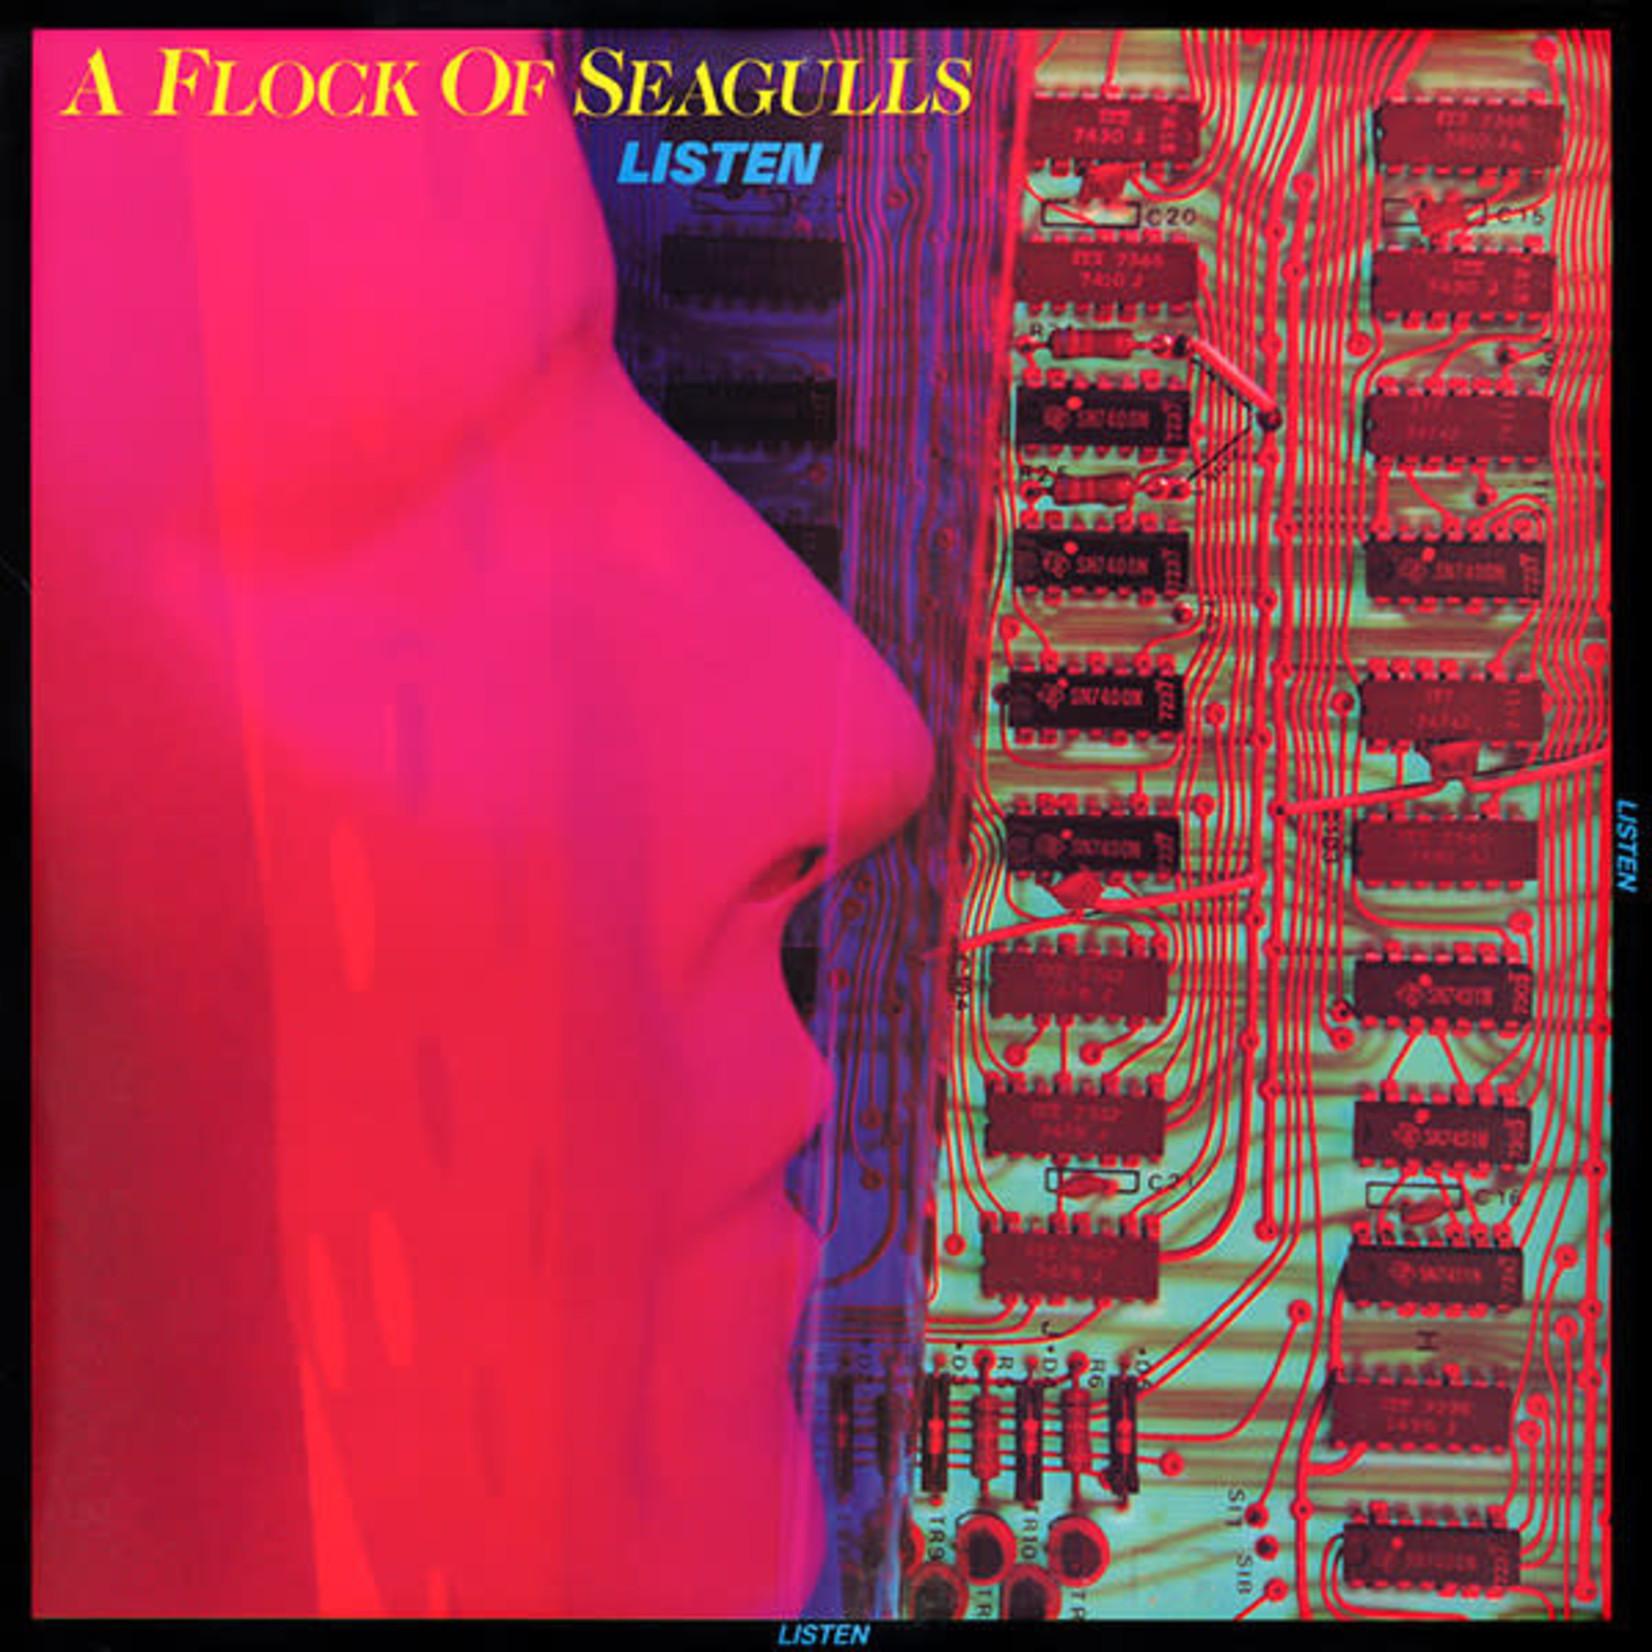 [Vintage] Flock of Seagulls: Listen